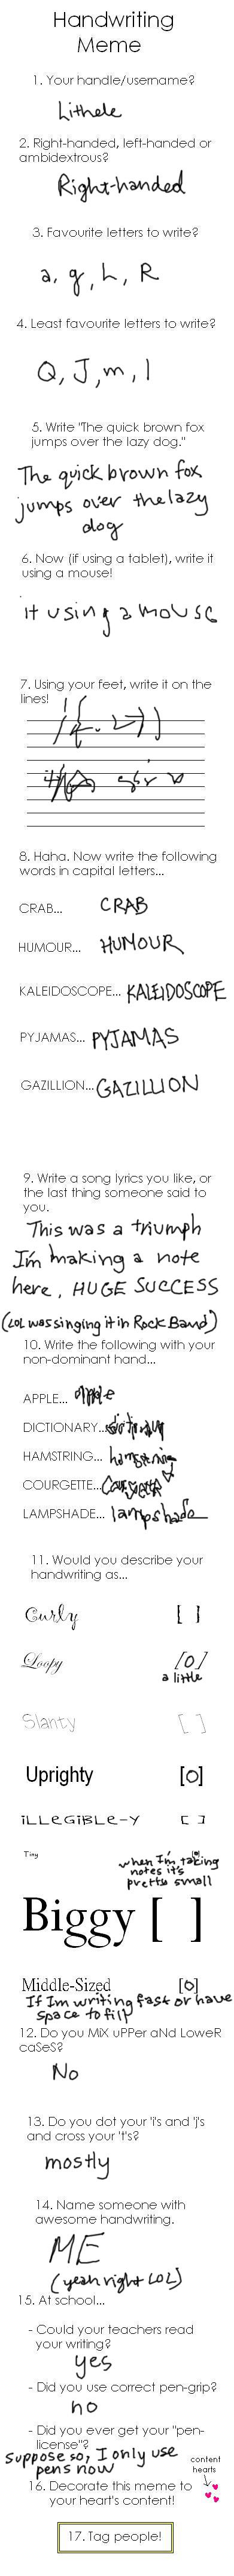 Handwriting meme by lithele